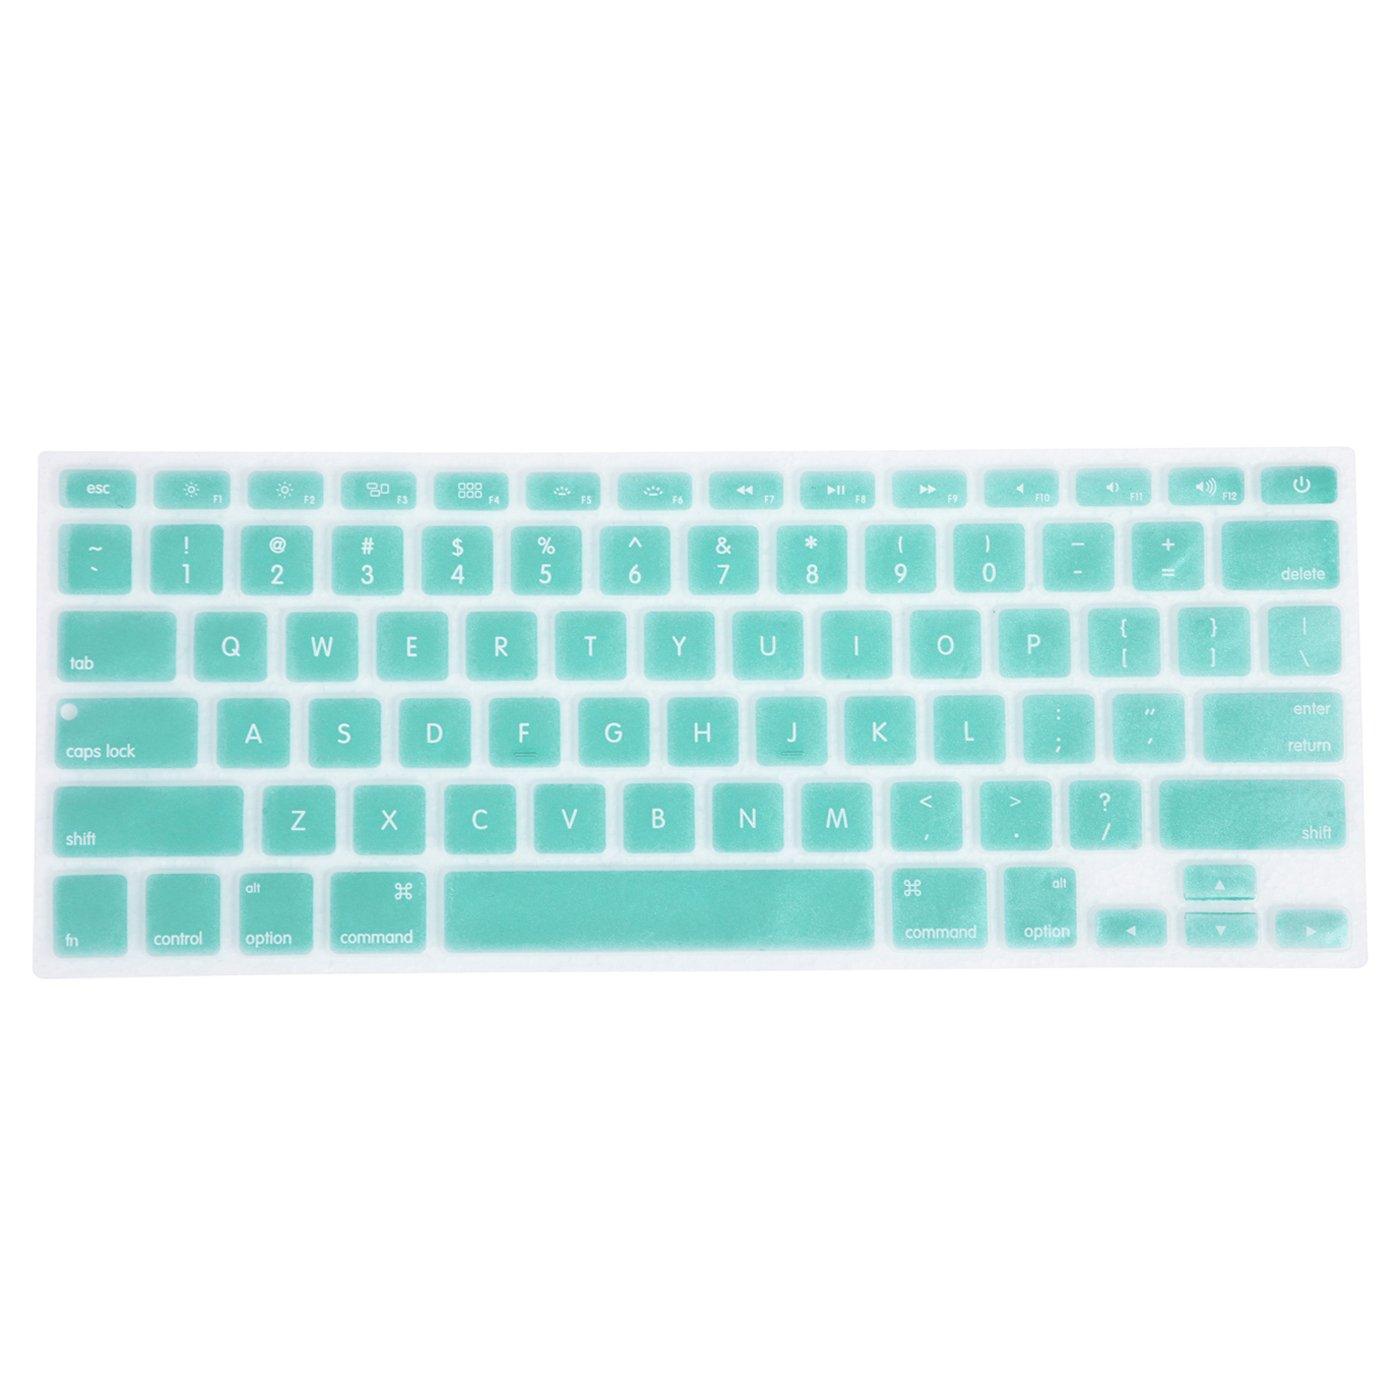 HDE Silicone Rubber Keyboard Skin Cover for Macbook Air 13 and MacBook Pro 13 Retina (Seafoam)